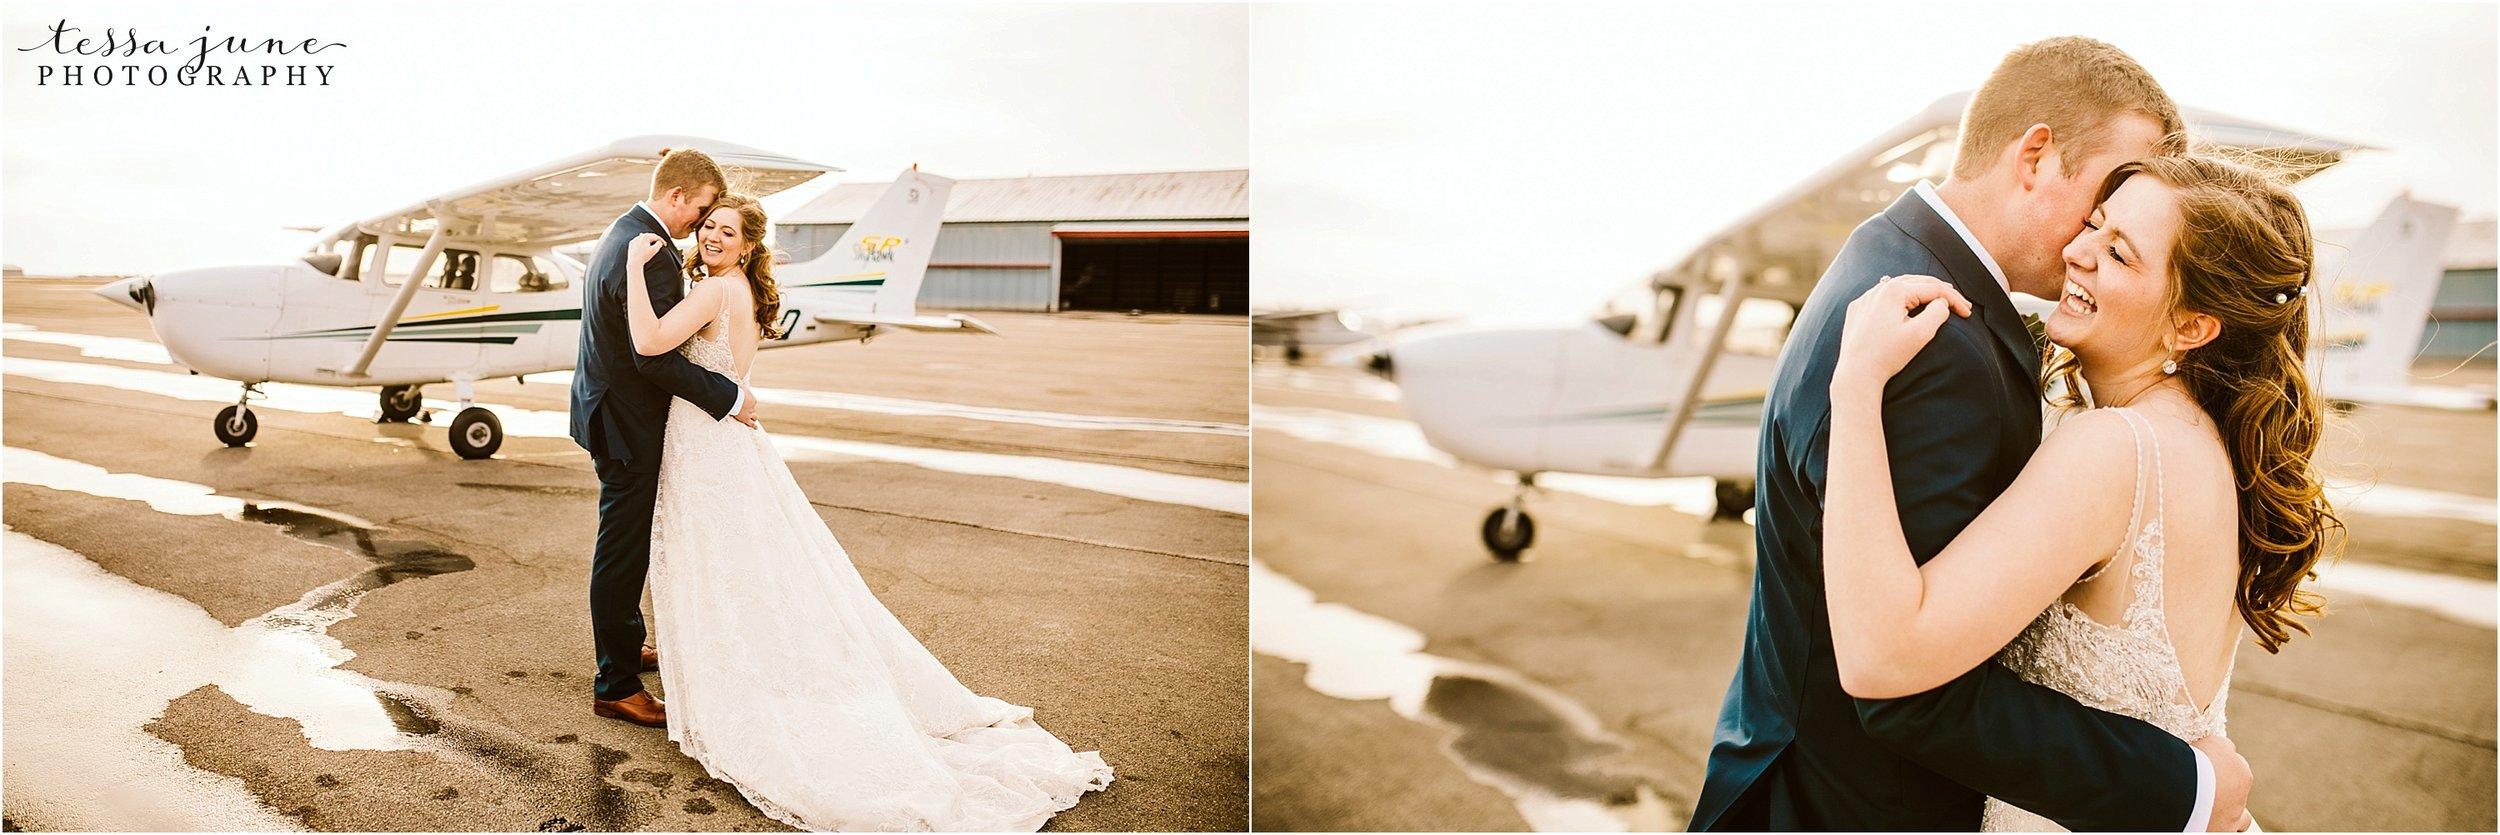 winter-wedding-in-eden-prairie-barn-minnesota-airplane-114.jpg